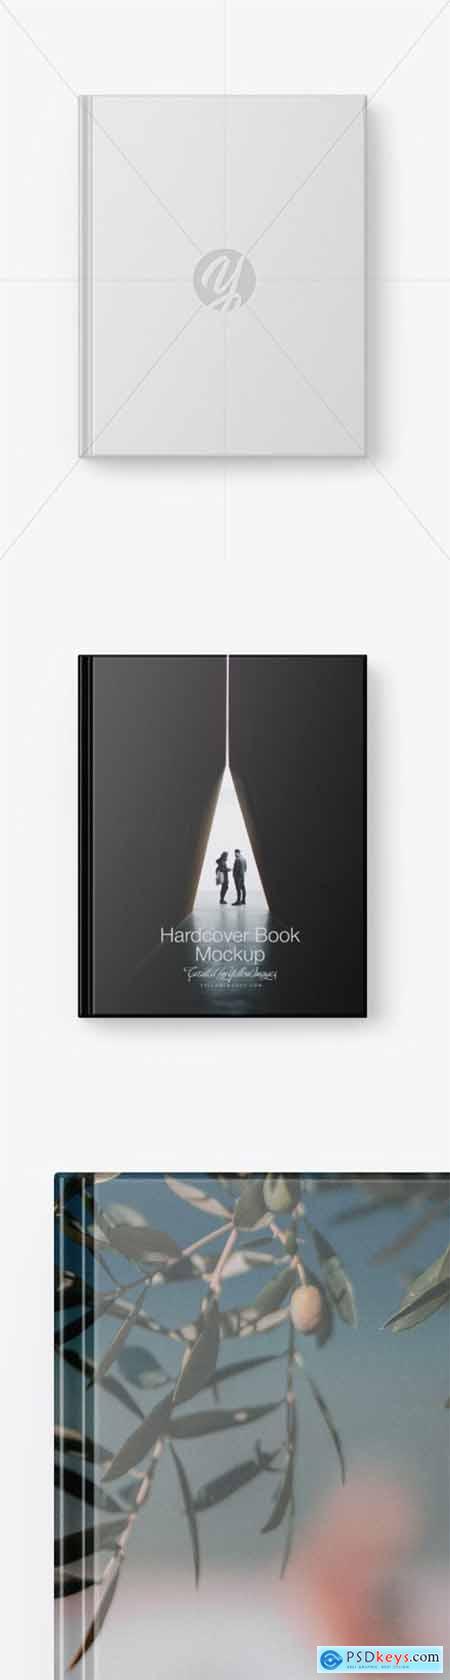 Hardcover Book w- Matte Cover Mockup 55473